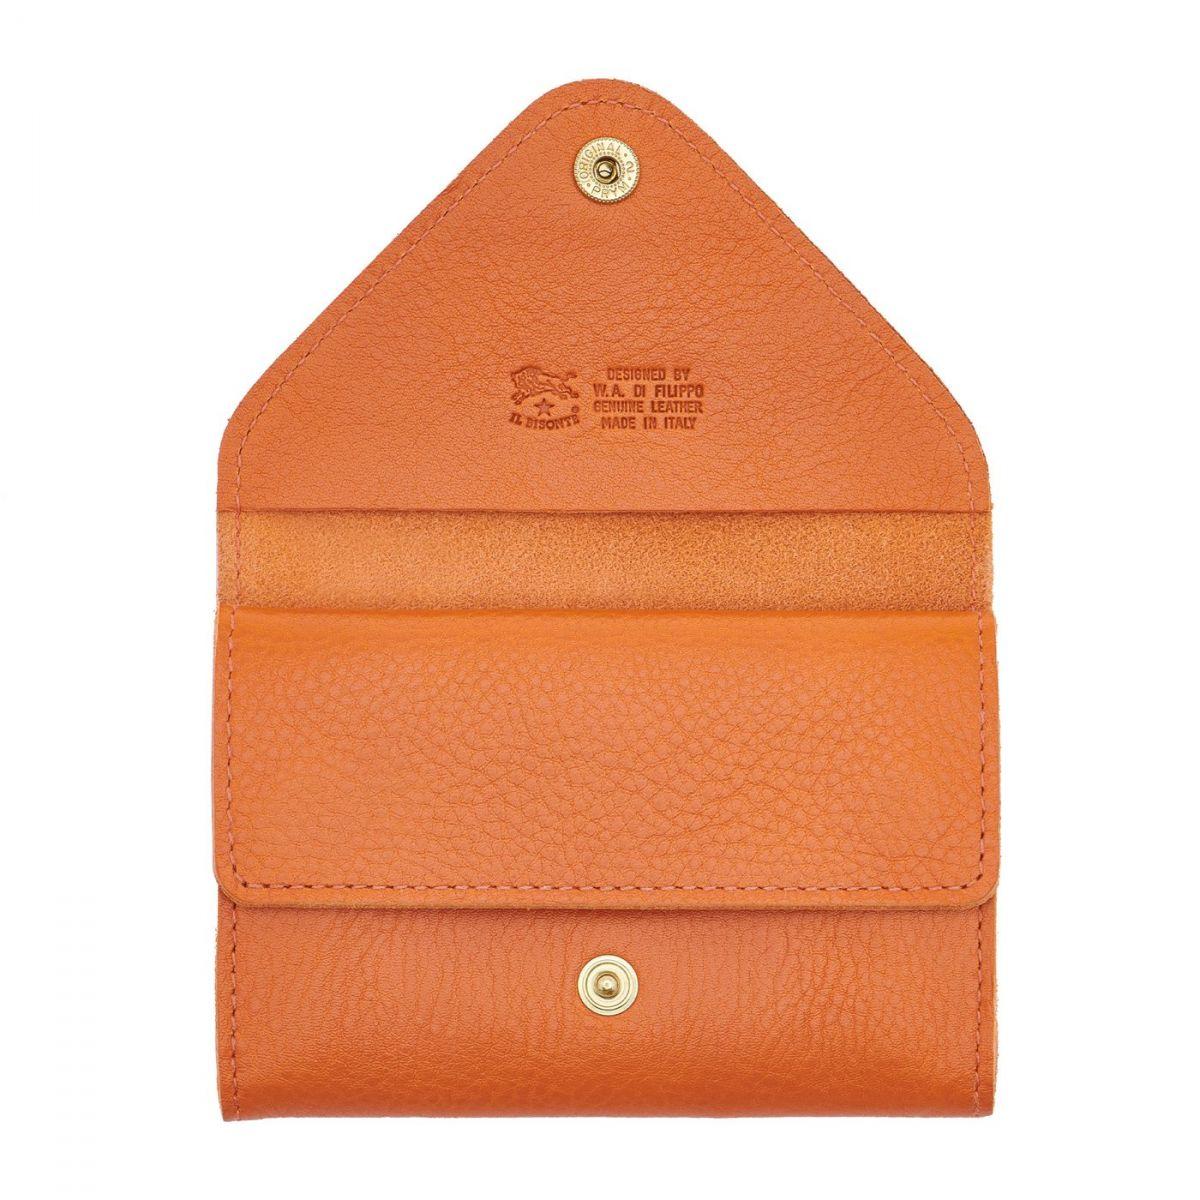 Card Case in Cowhide Double Leather color Orange - SCC039 | Details